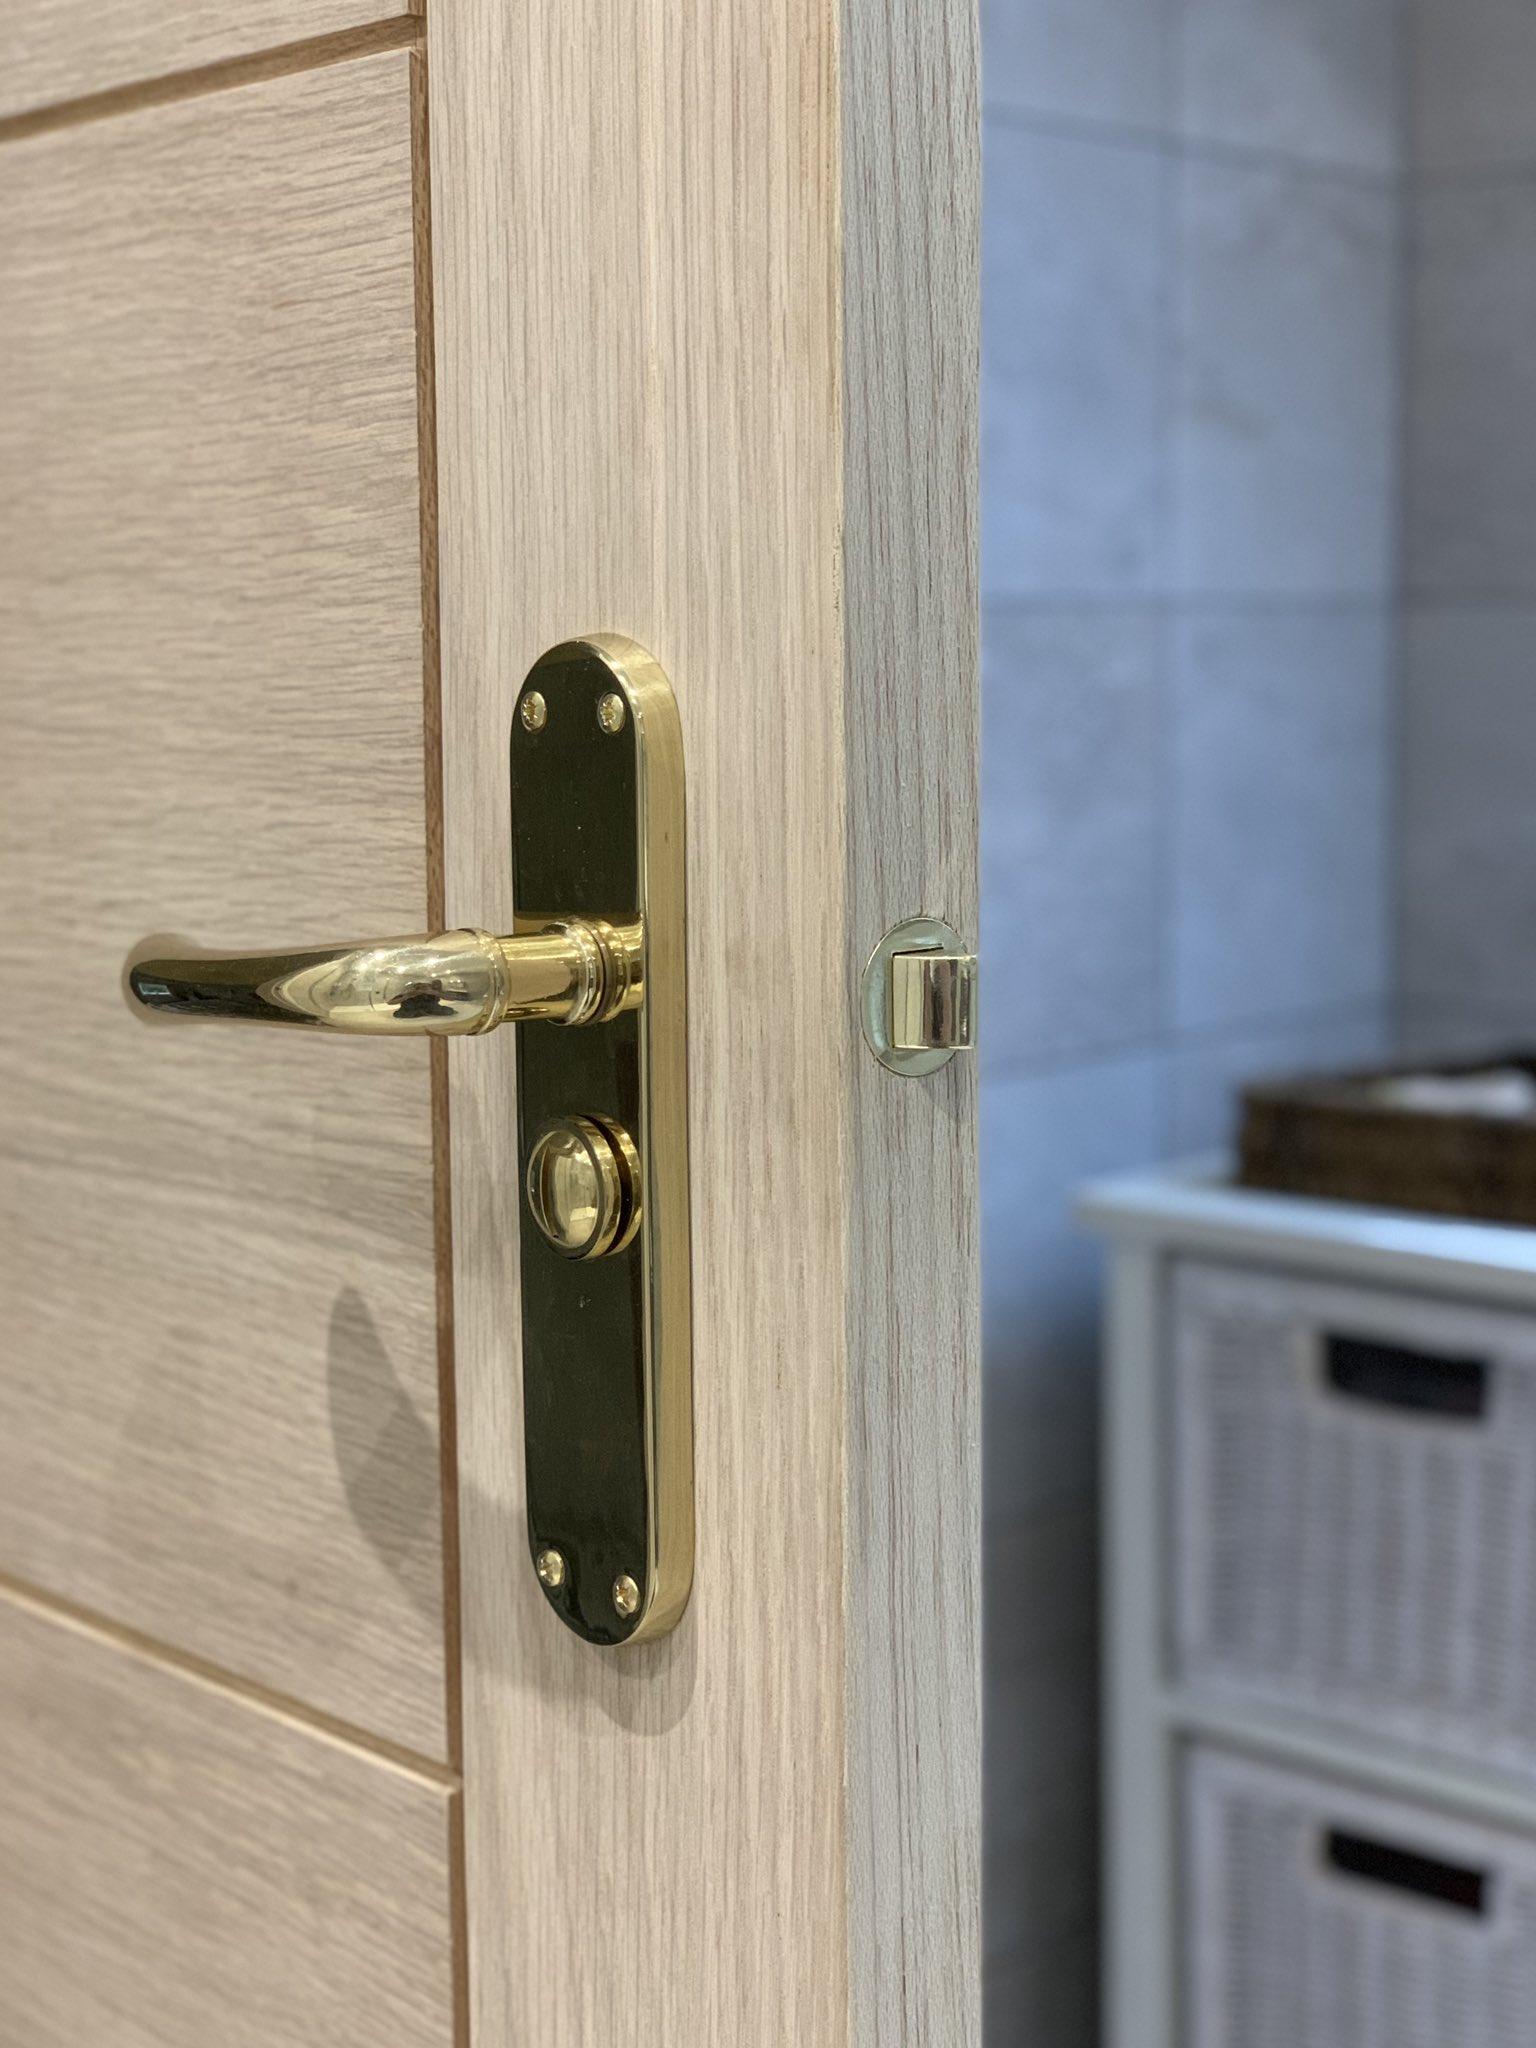 Bespoke Door Handles - Carpentry Services Poole